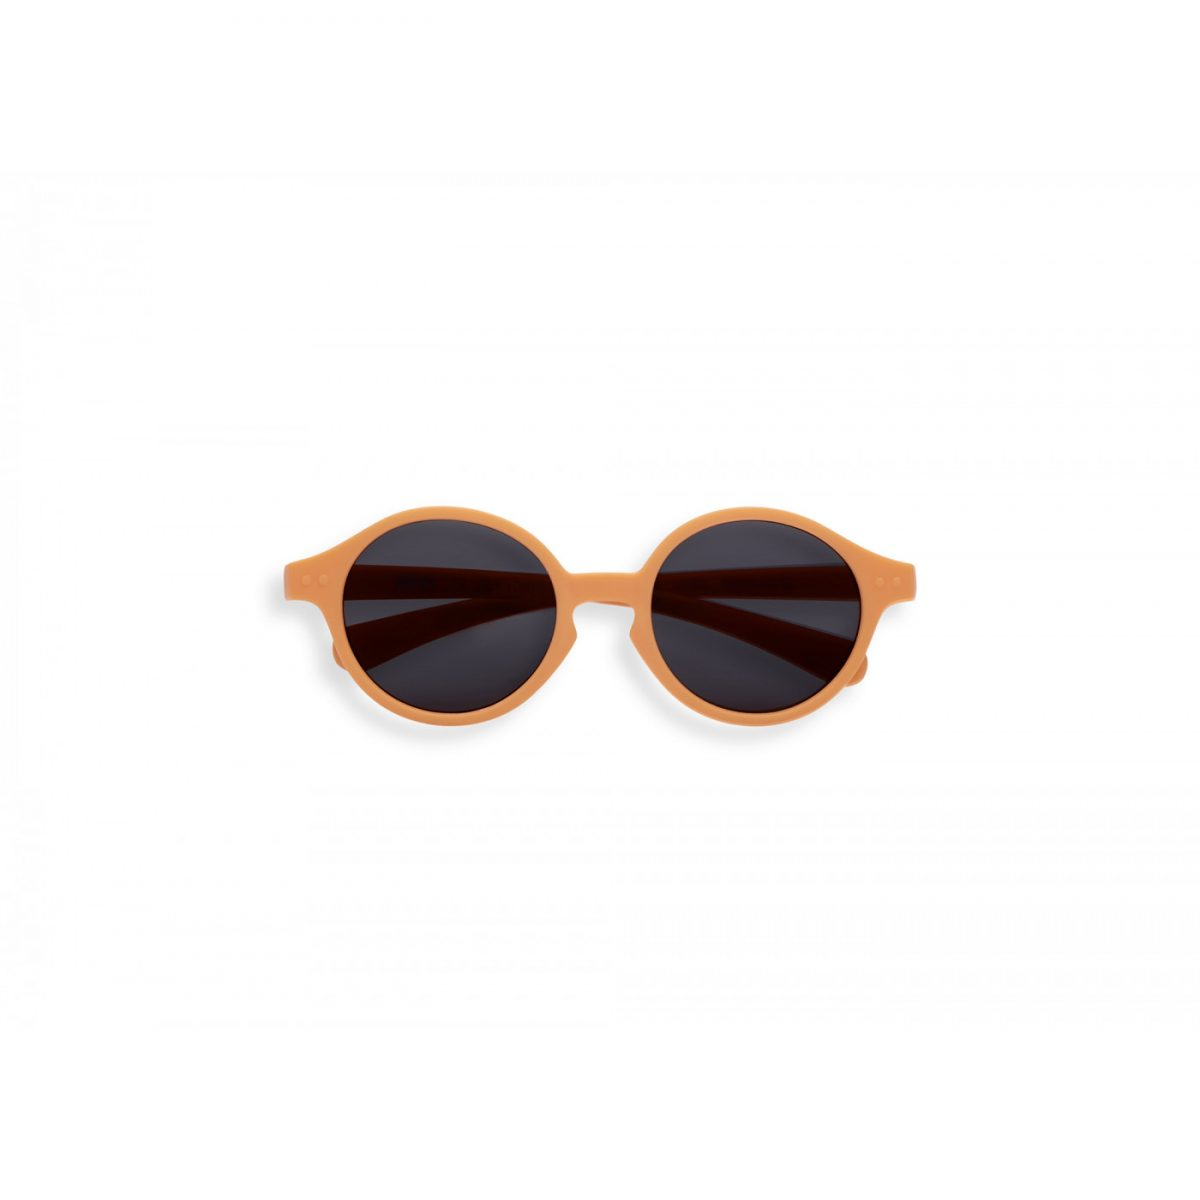 sun-kids-orange-flash-sunglasses-baby